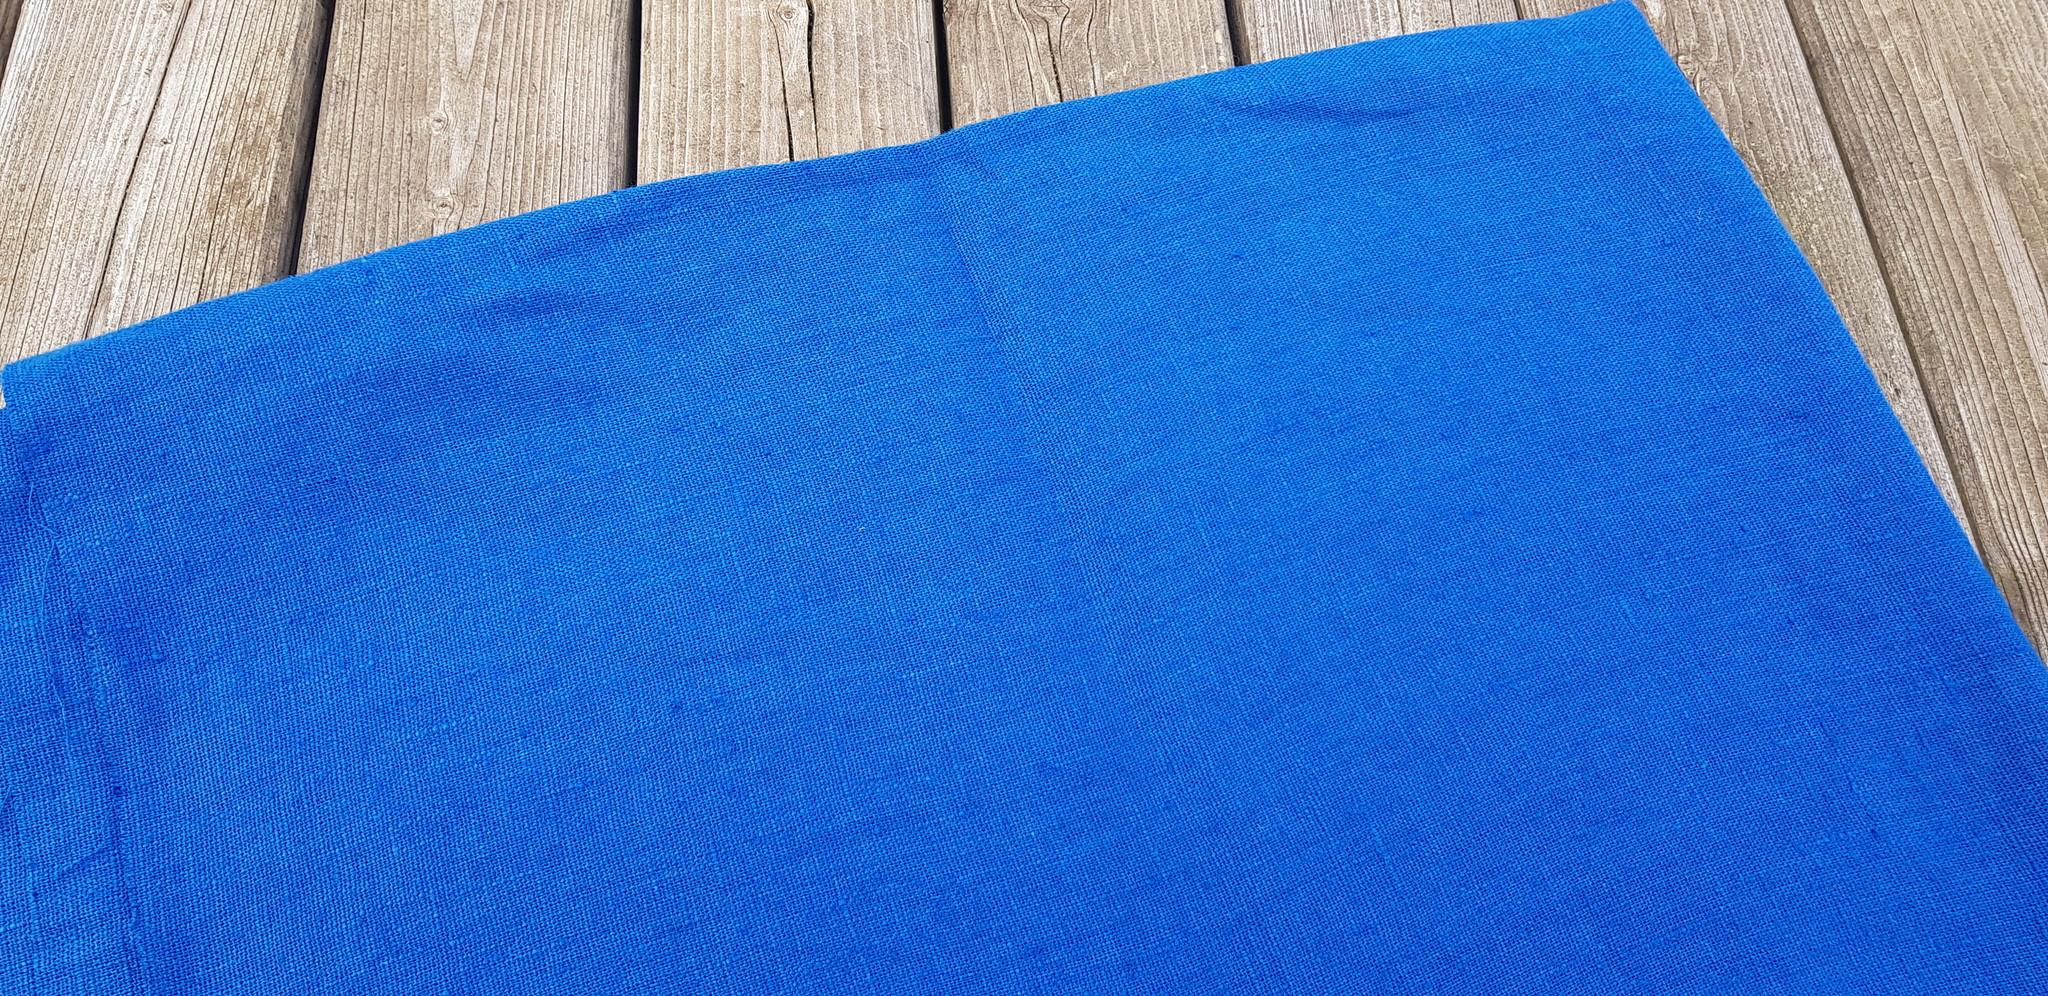 Le grenier du lin washed linen fabric